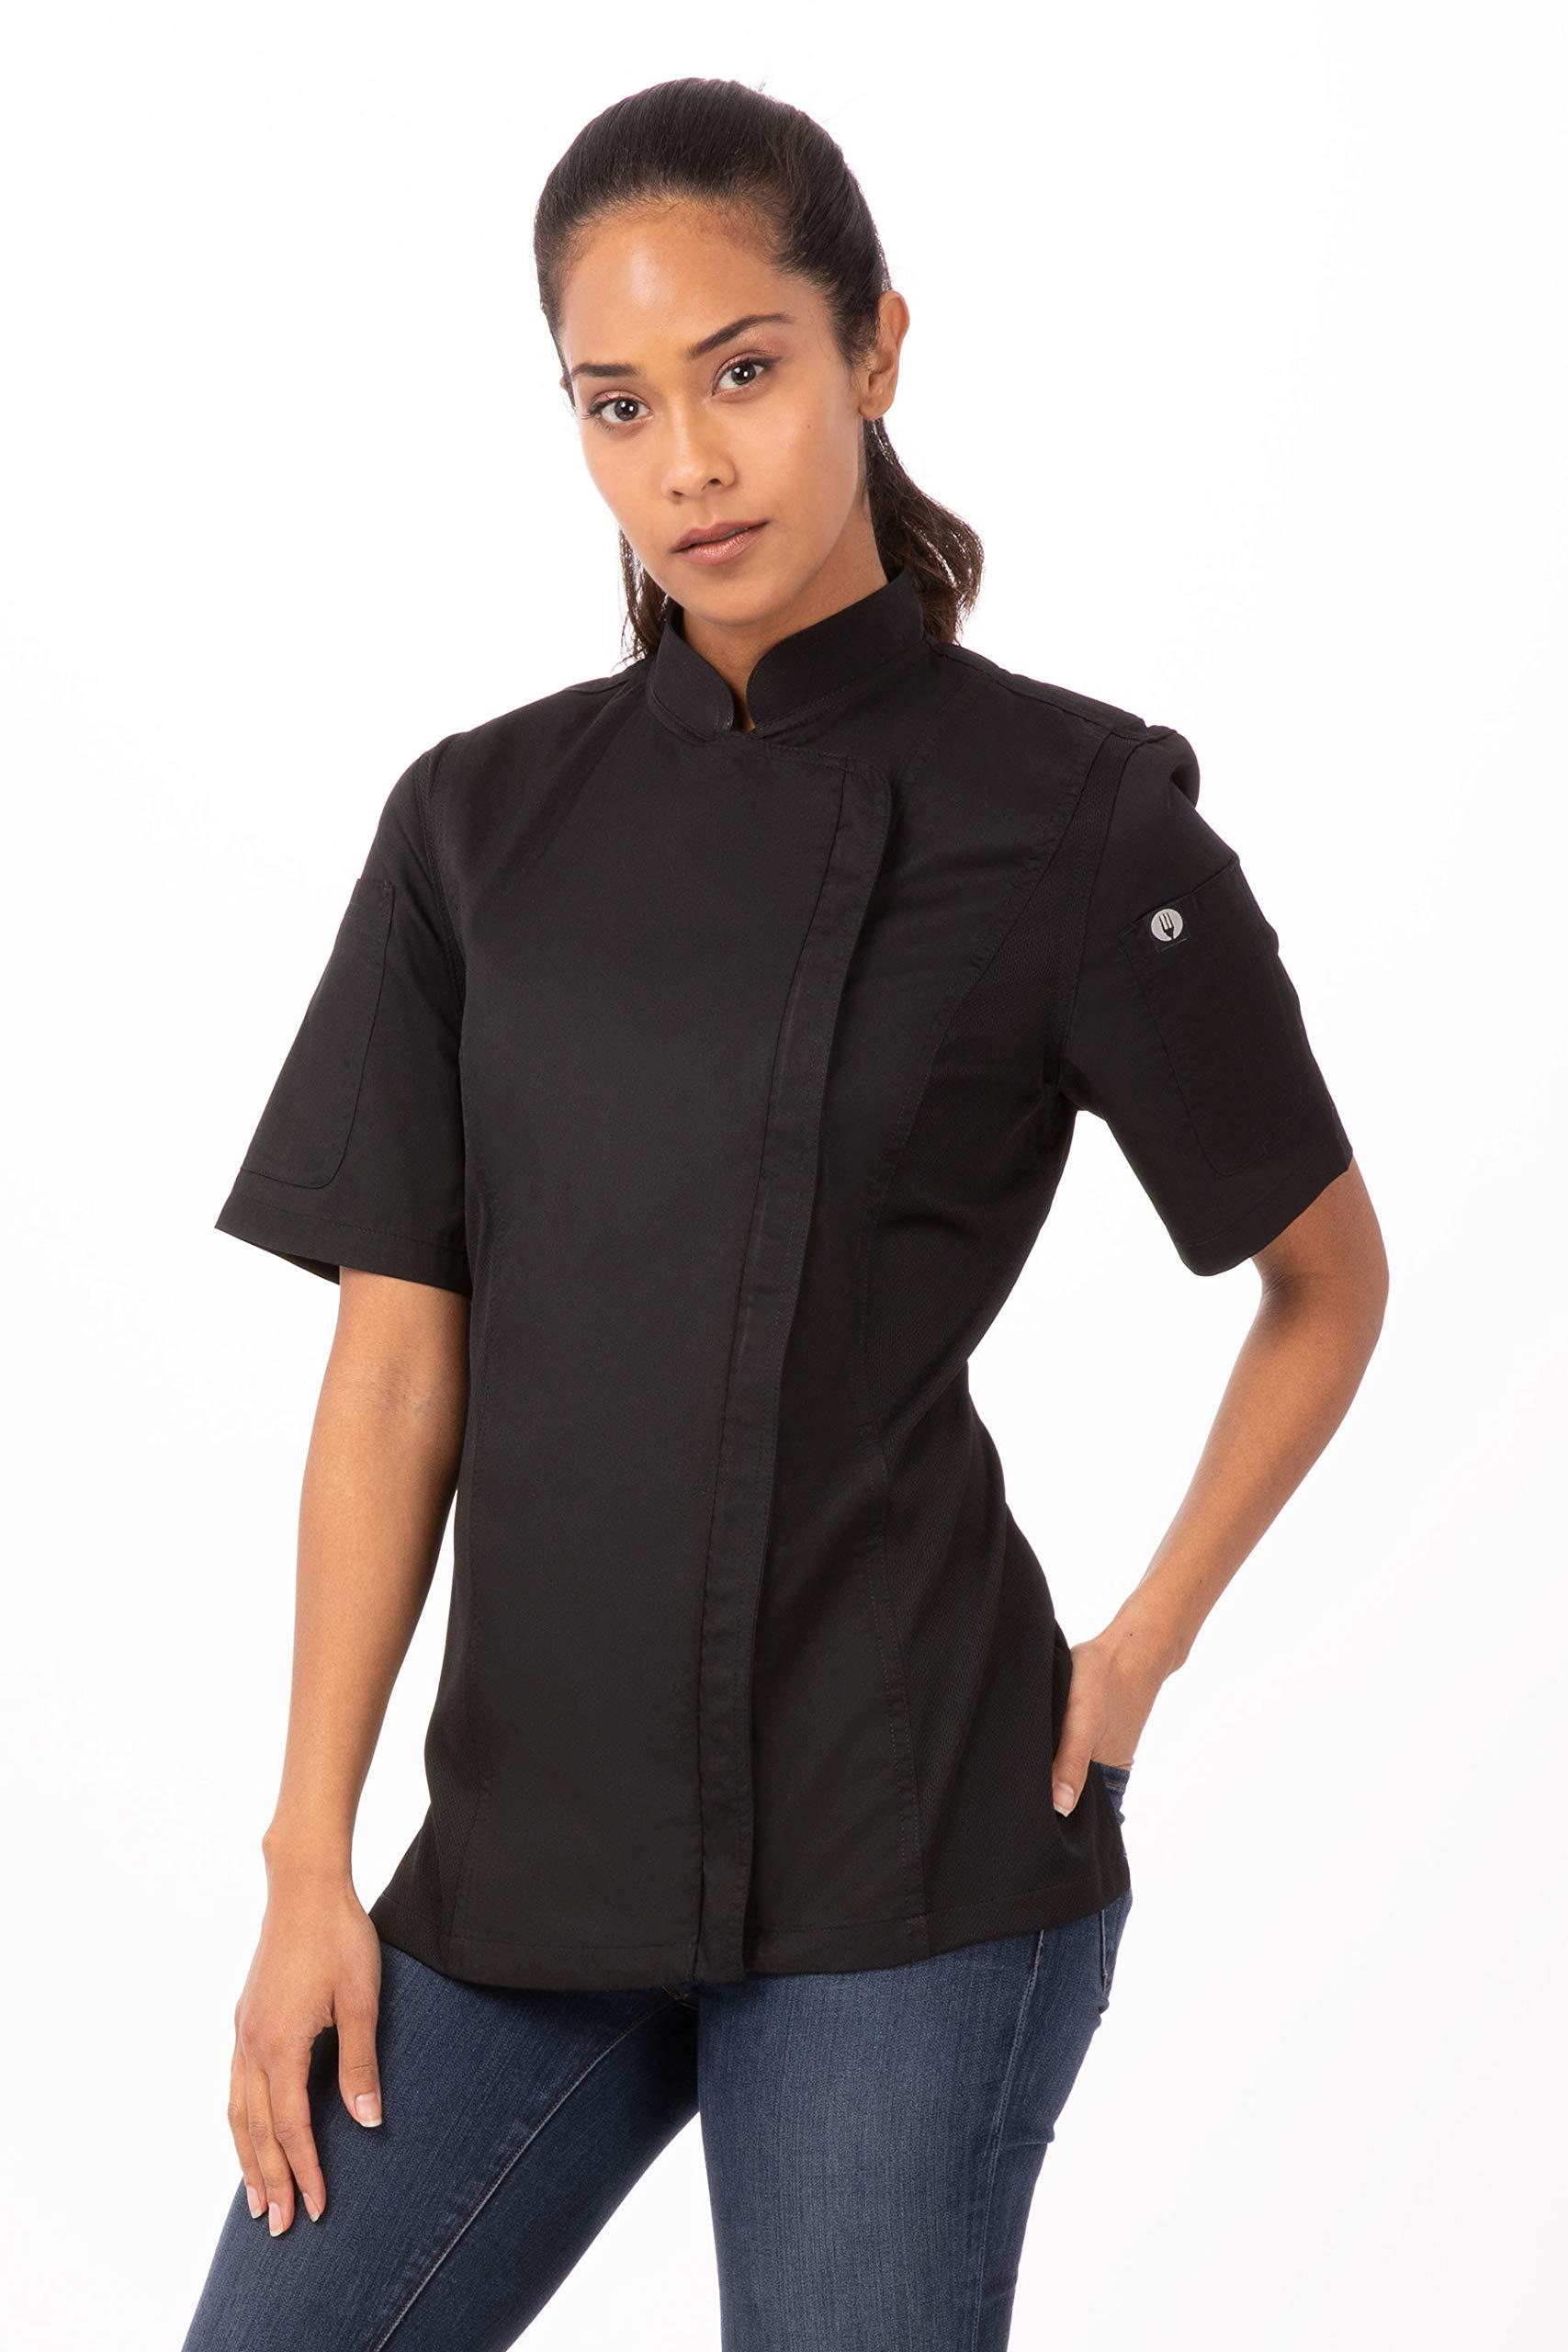 Chef Works Women's Springfield Chef Coat, Black, Medium by Chef Works